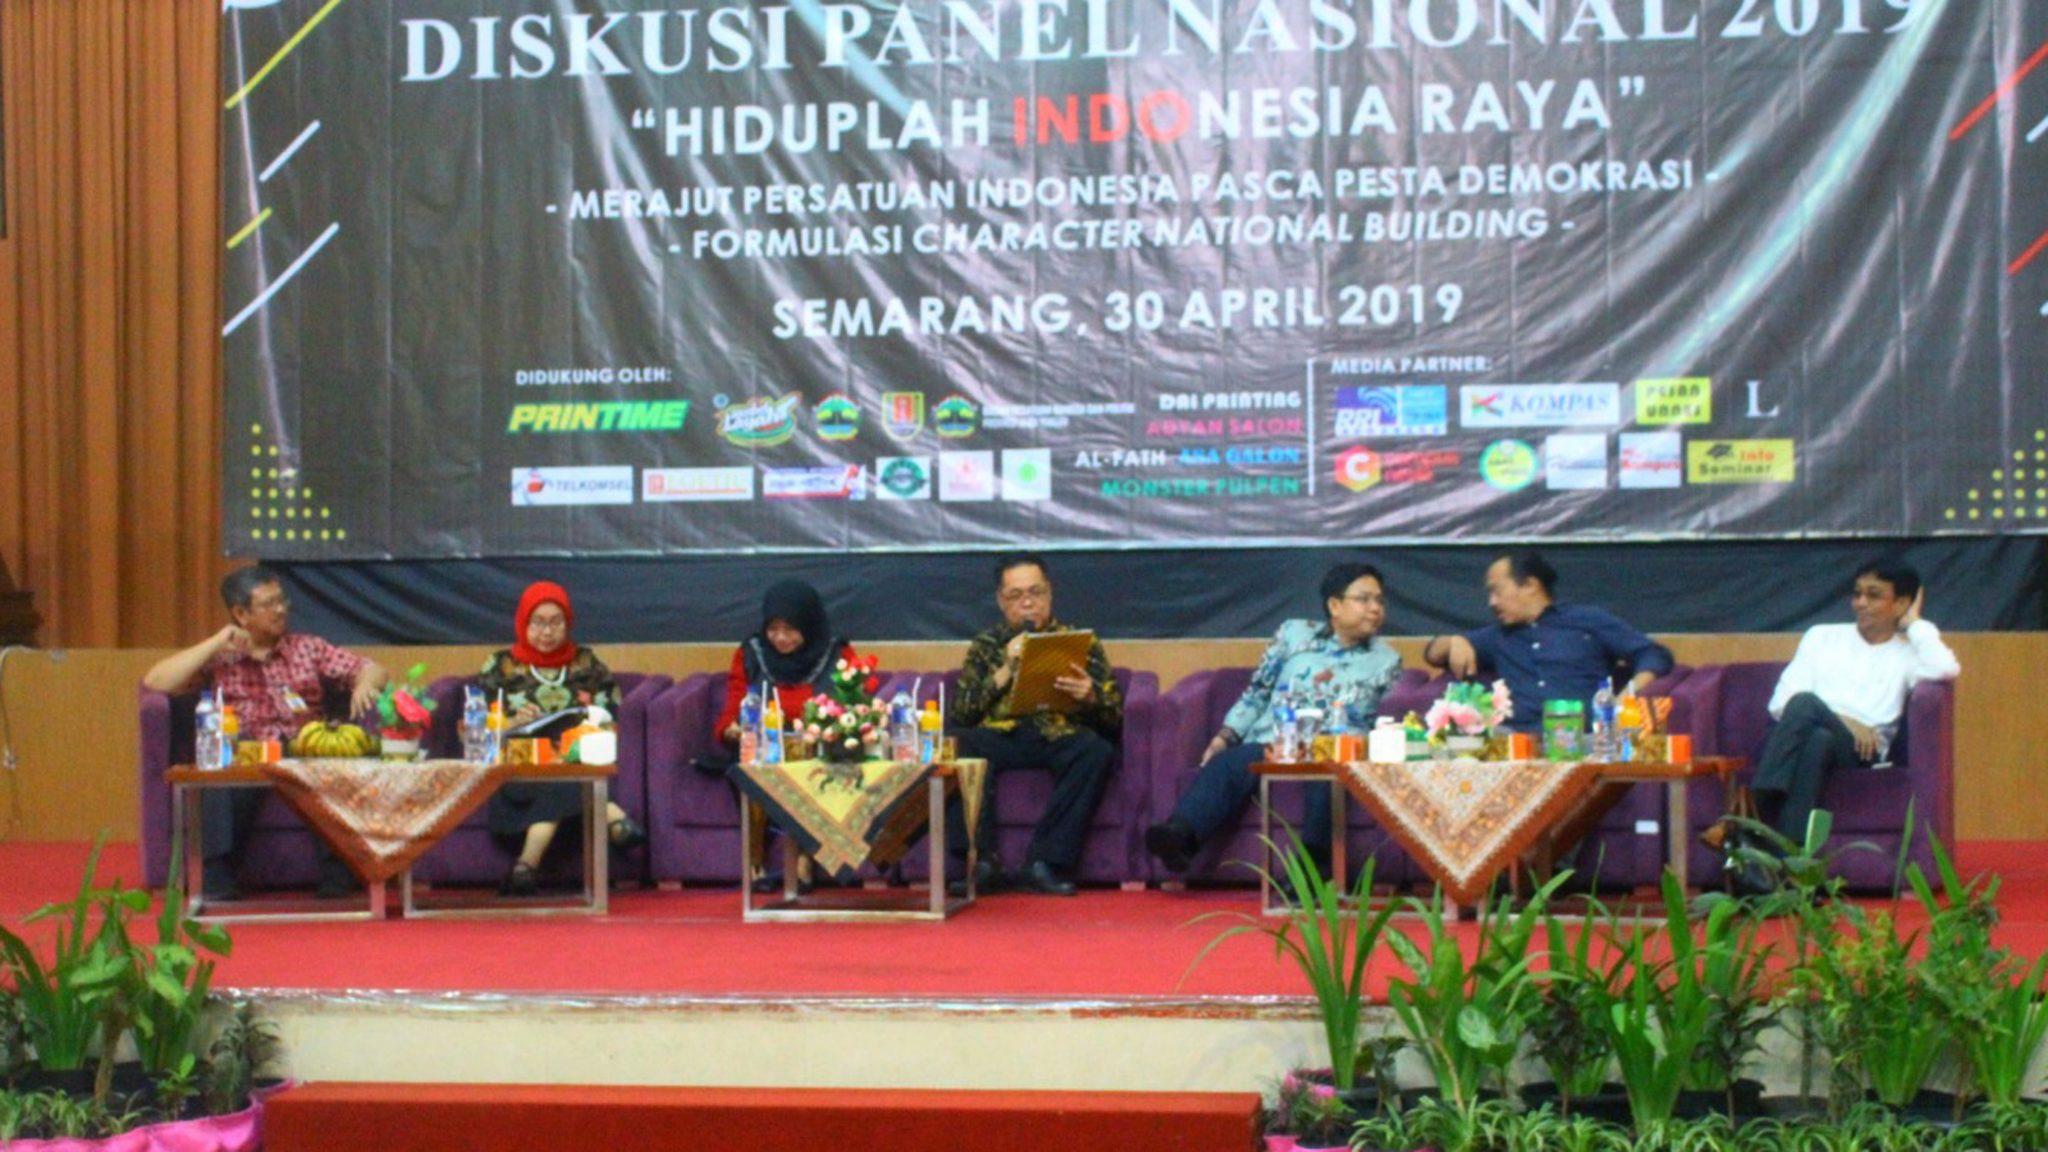 "Diskusi Panel Nasional 2019 : ""Hiduplah Indonesia Raya"""